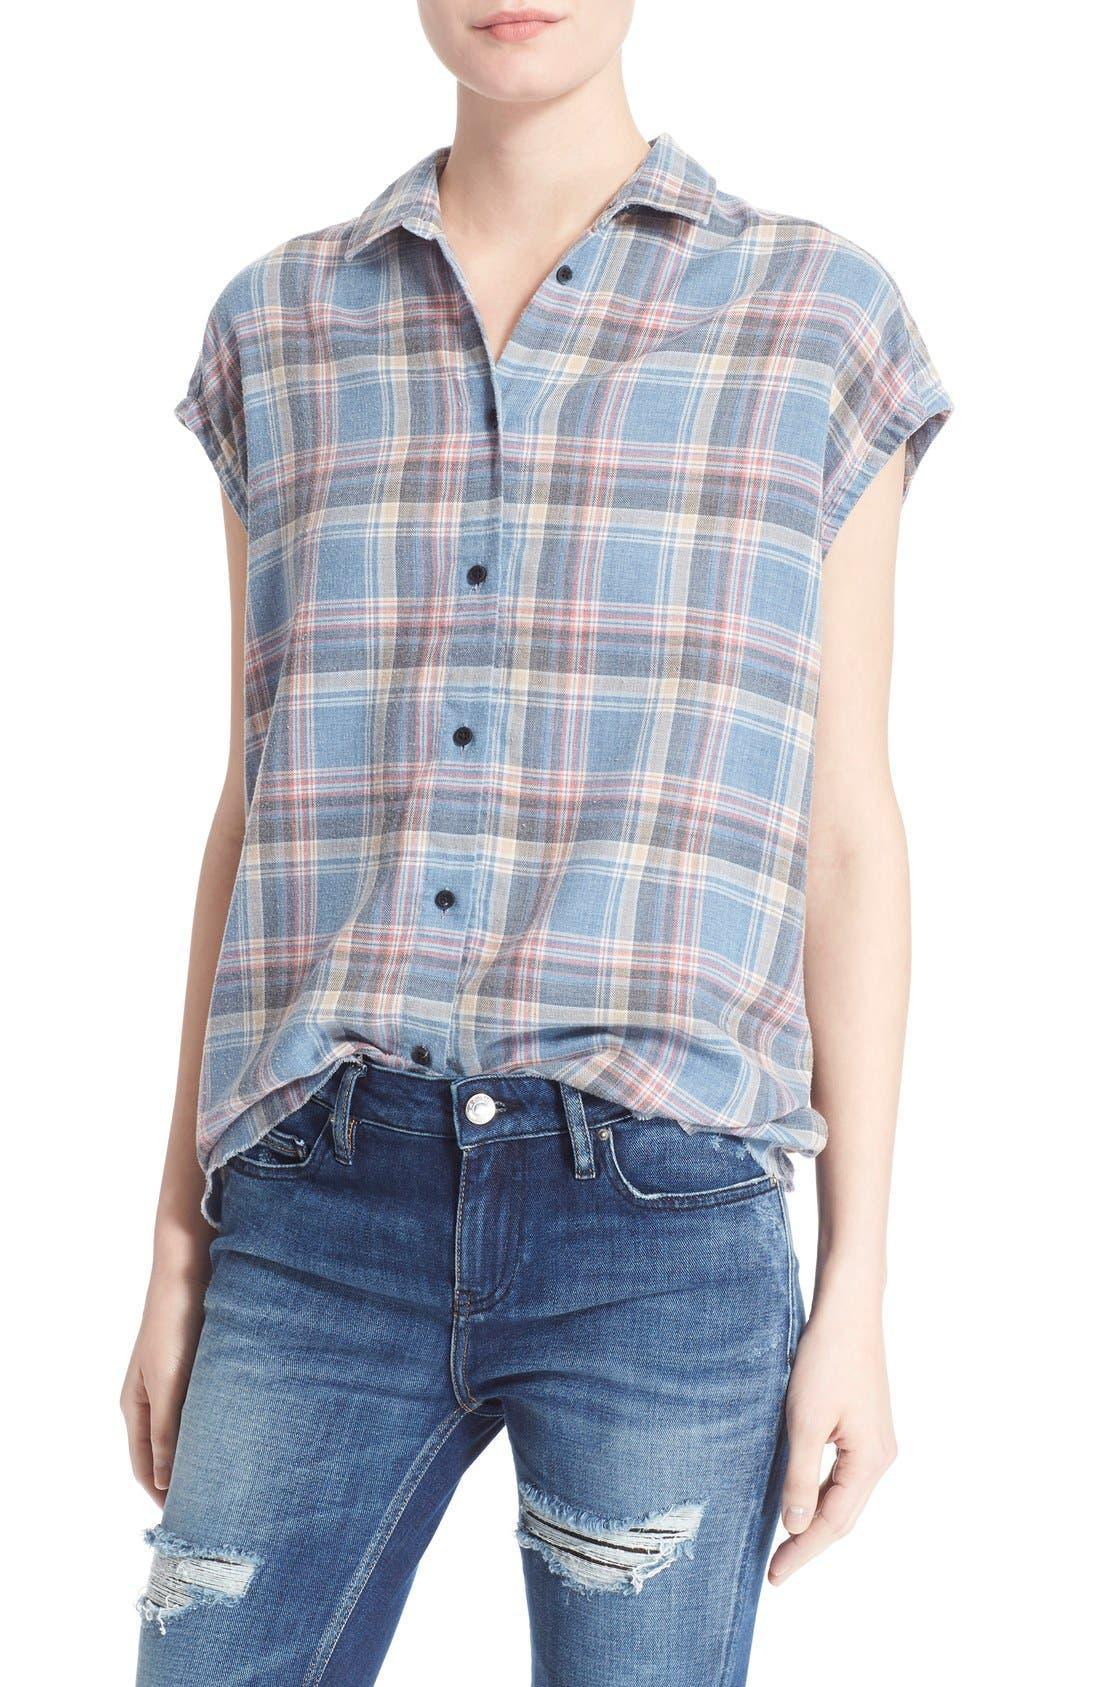 Alternate Image 1 Selected - IRO 'Dally' Woven Plaid Cap Sleeve Shirt